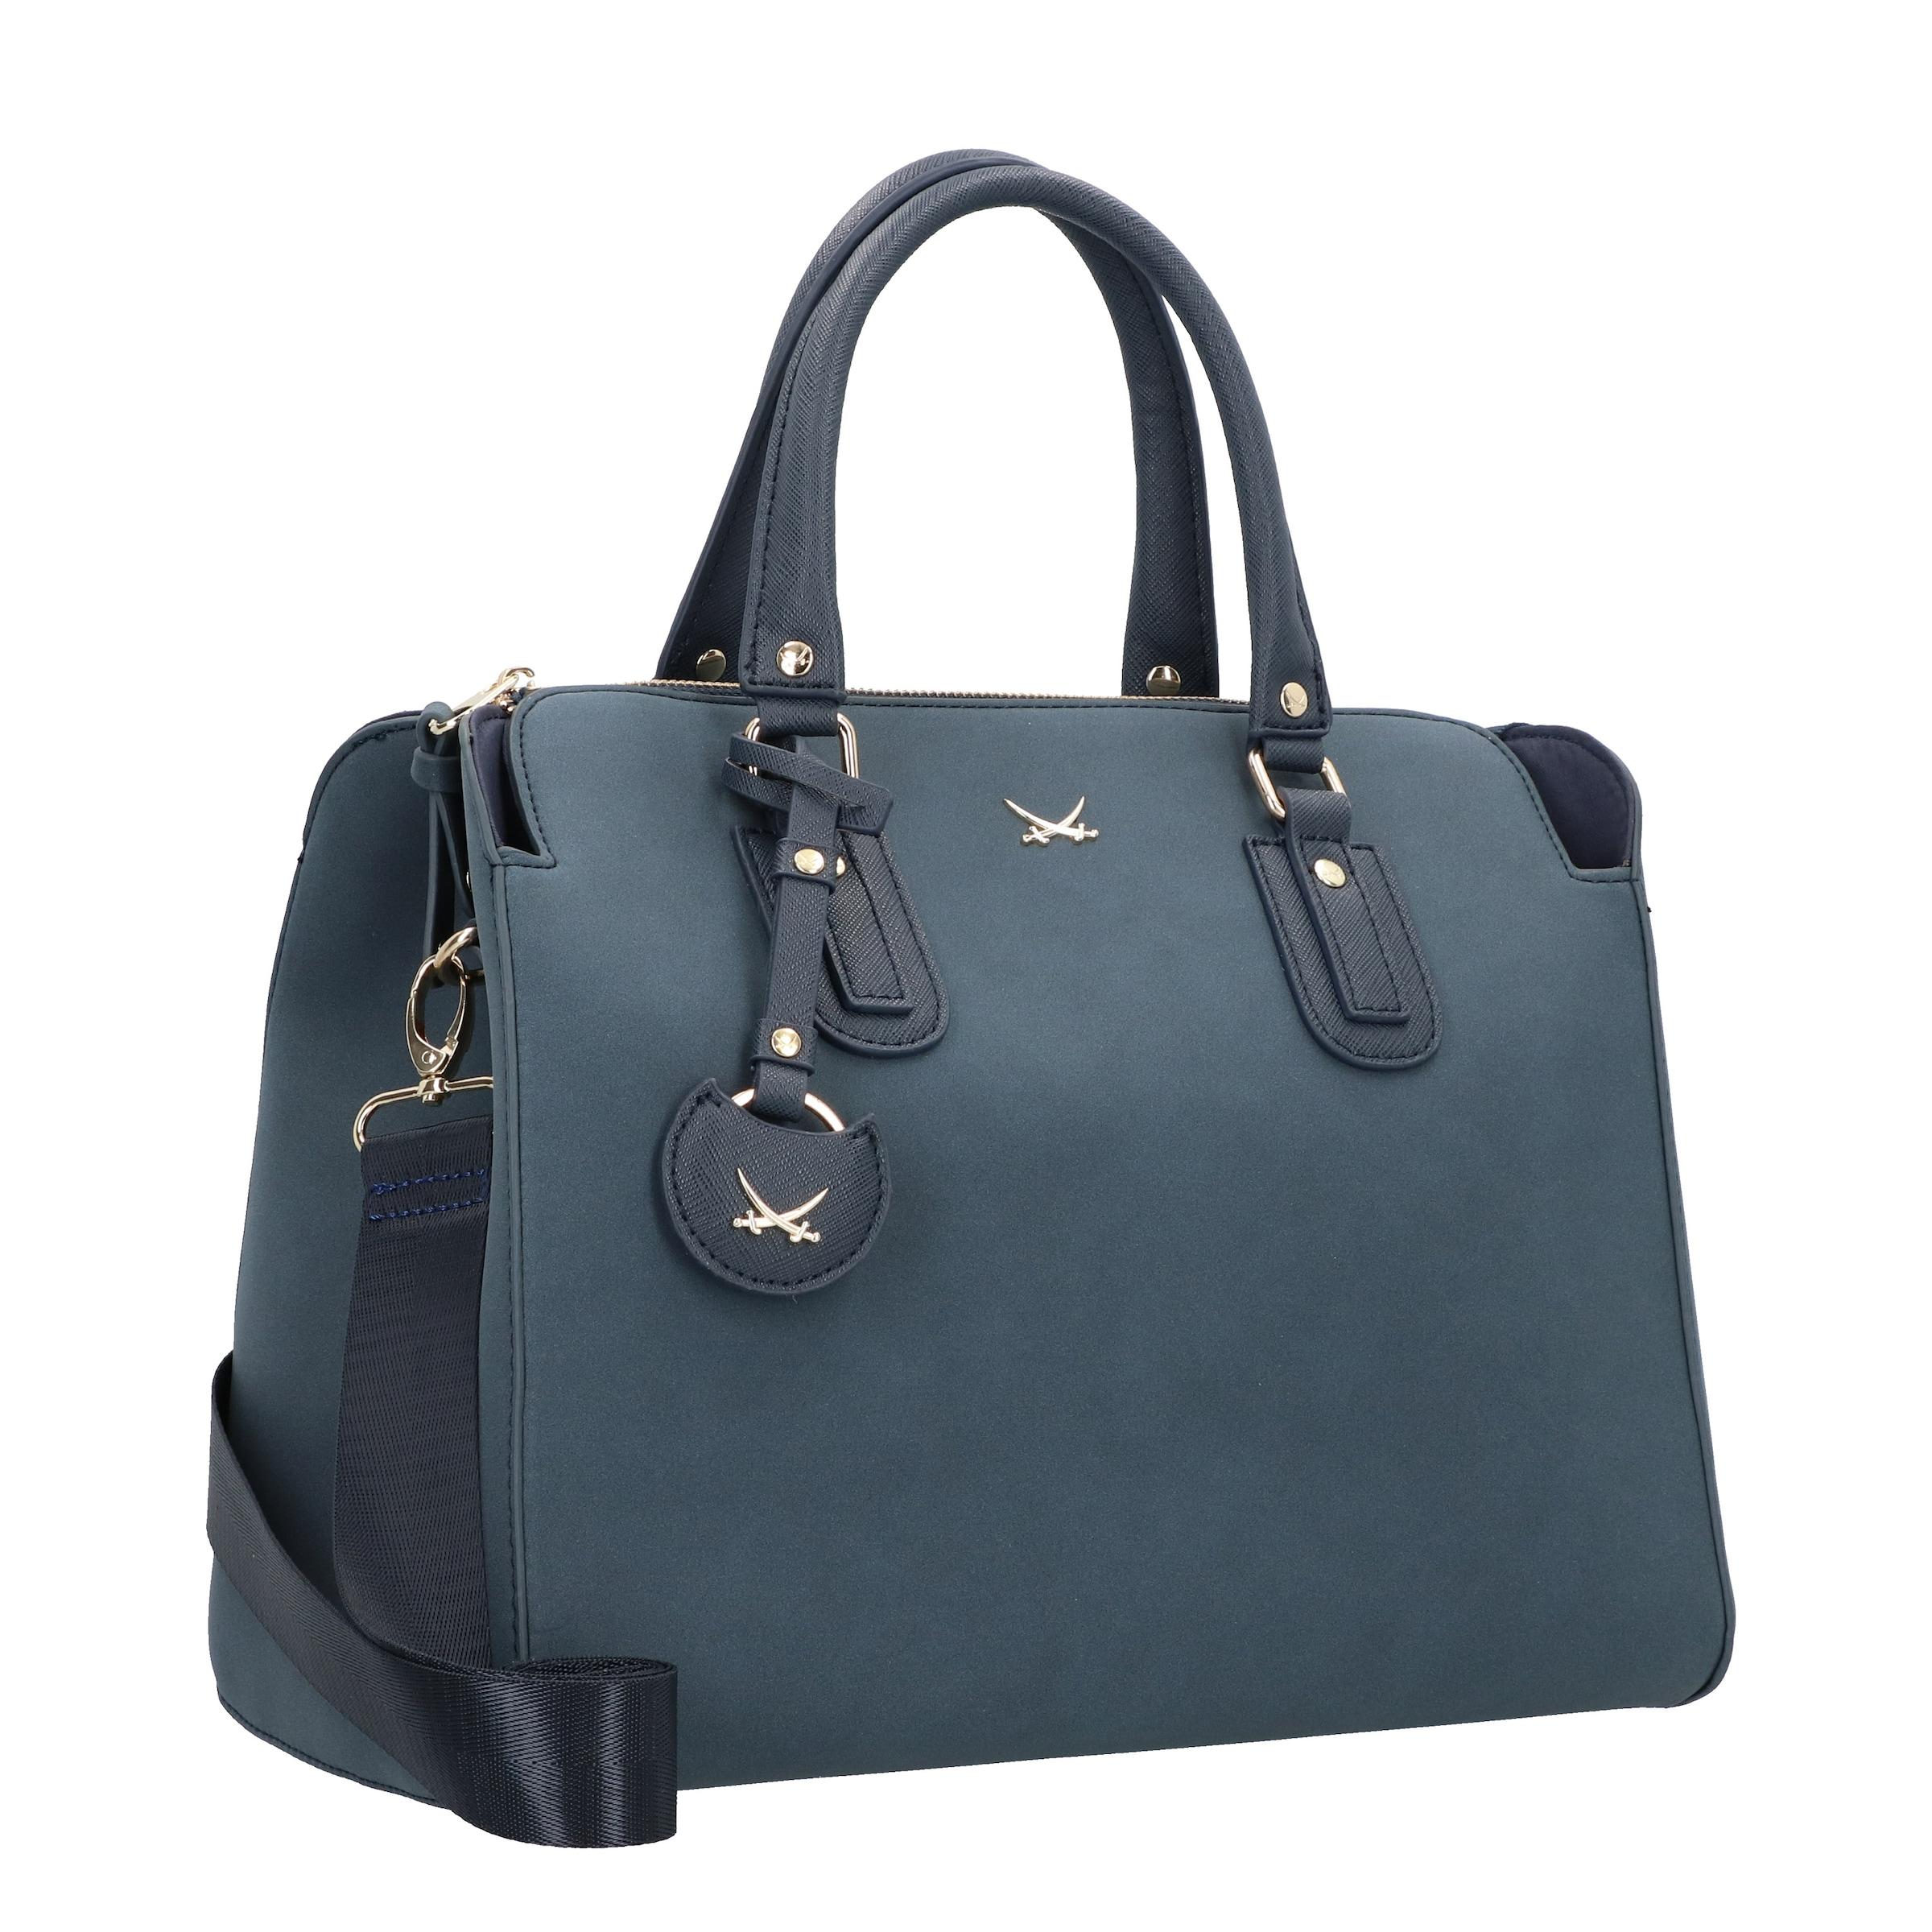 Blau In Handtasche Blau Sansibar Handtasche In Sansibar Sansibar nP8w0Ok